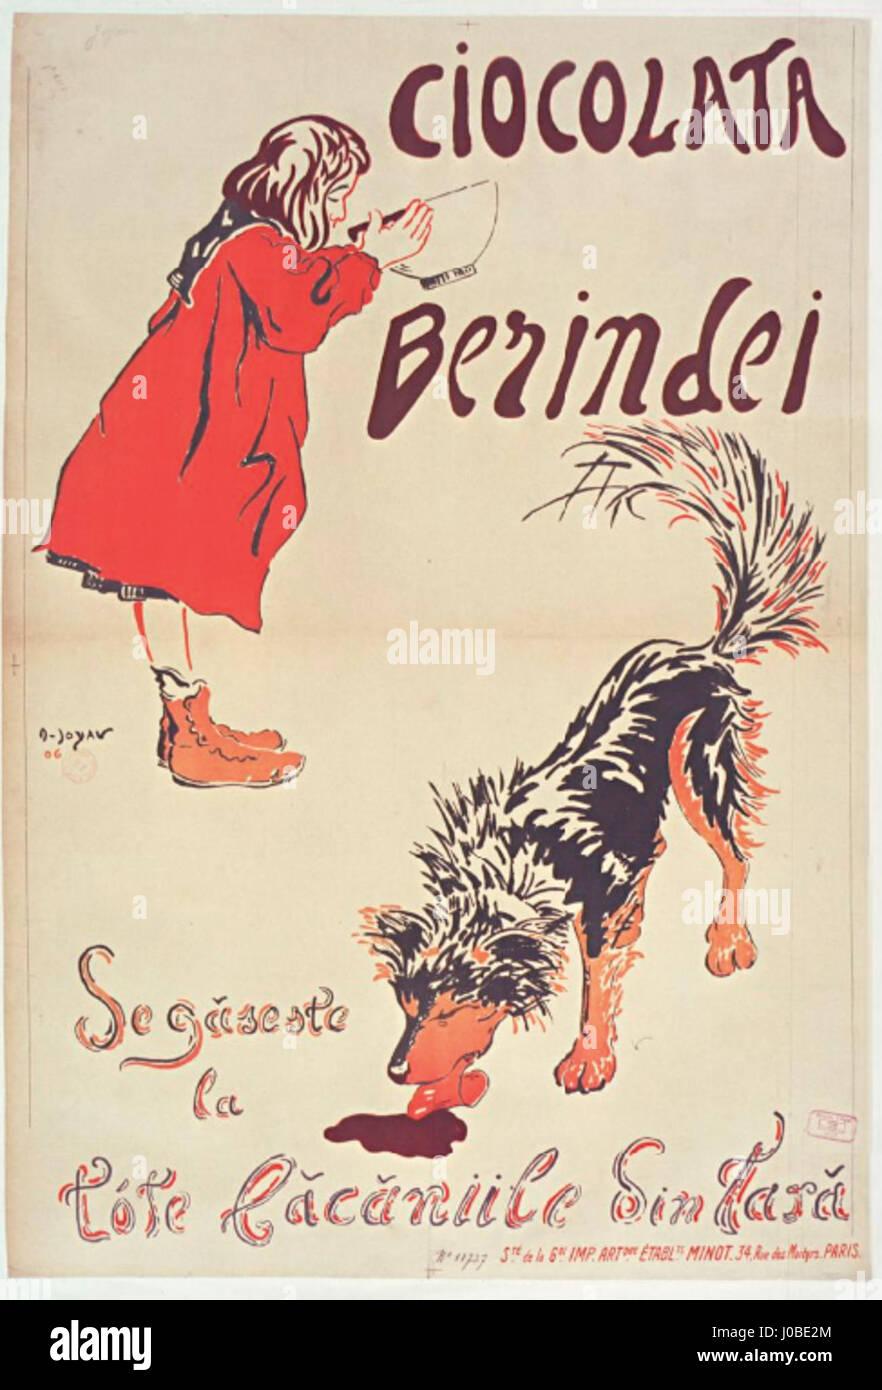 Ciocolata Berindei poster Amédée Joyau Stock Photo